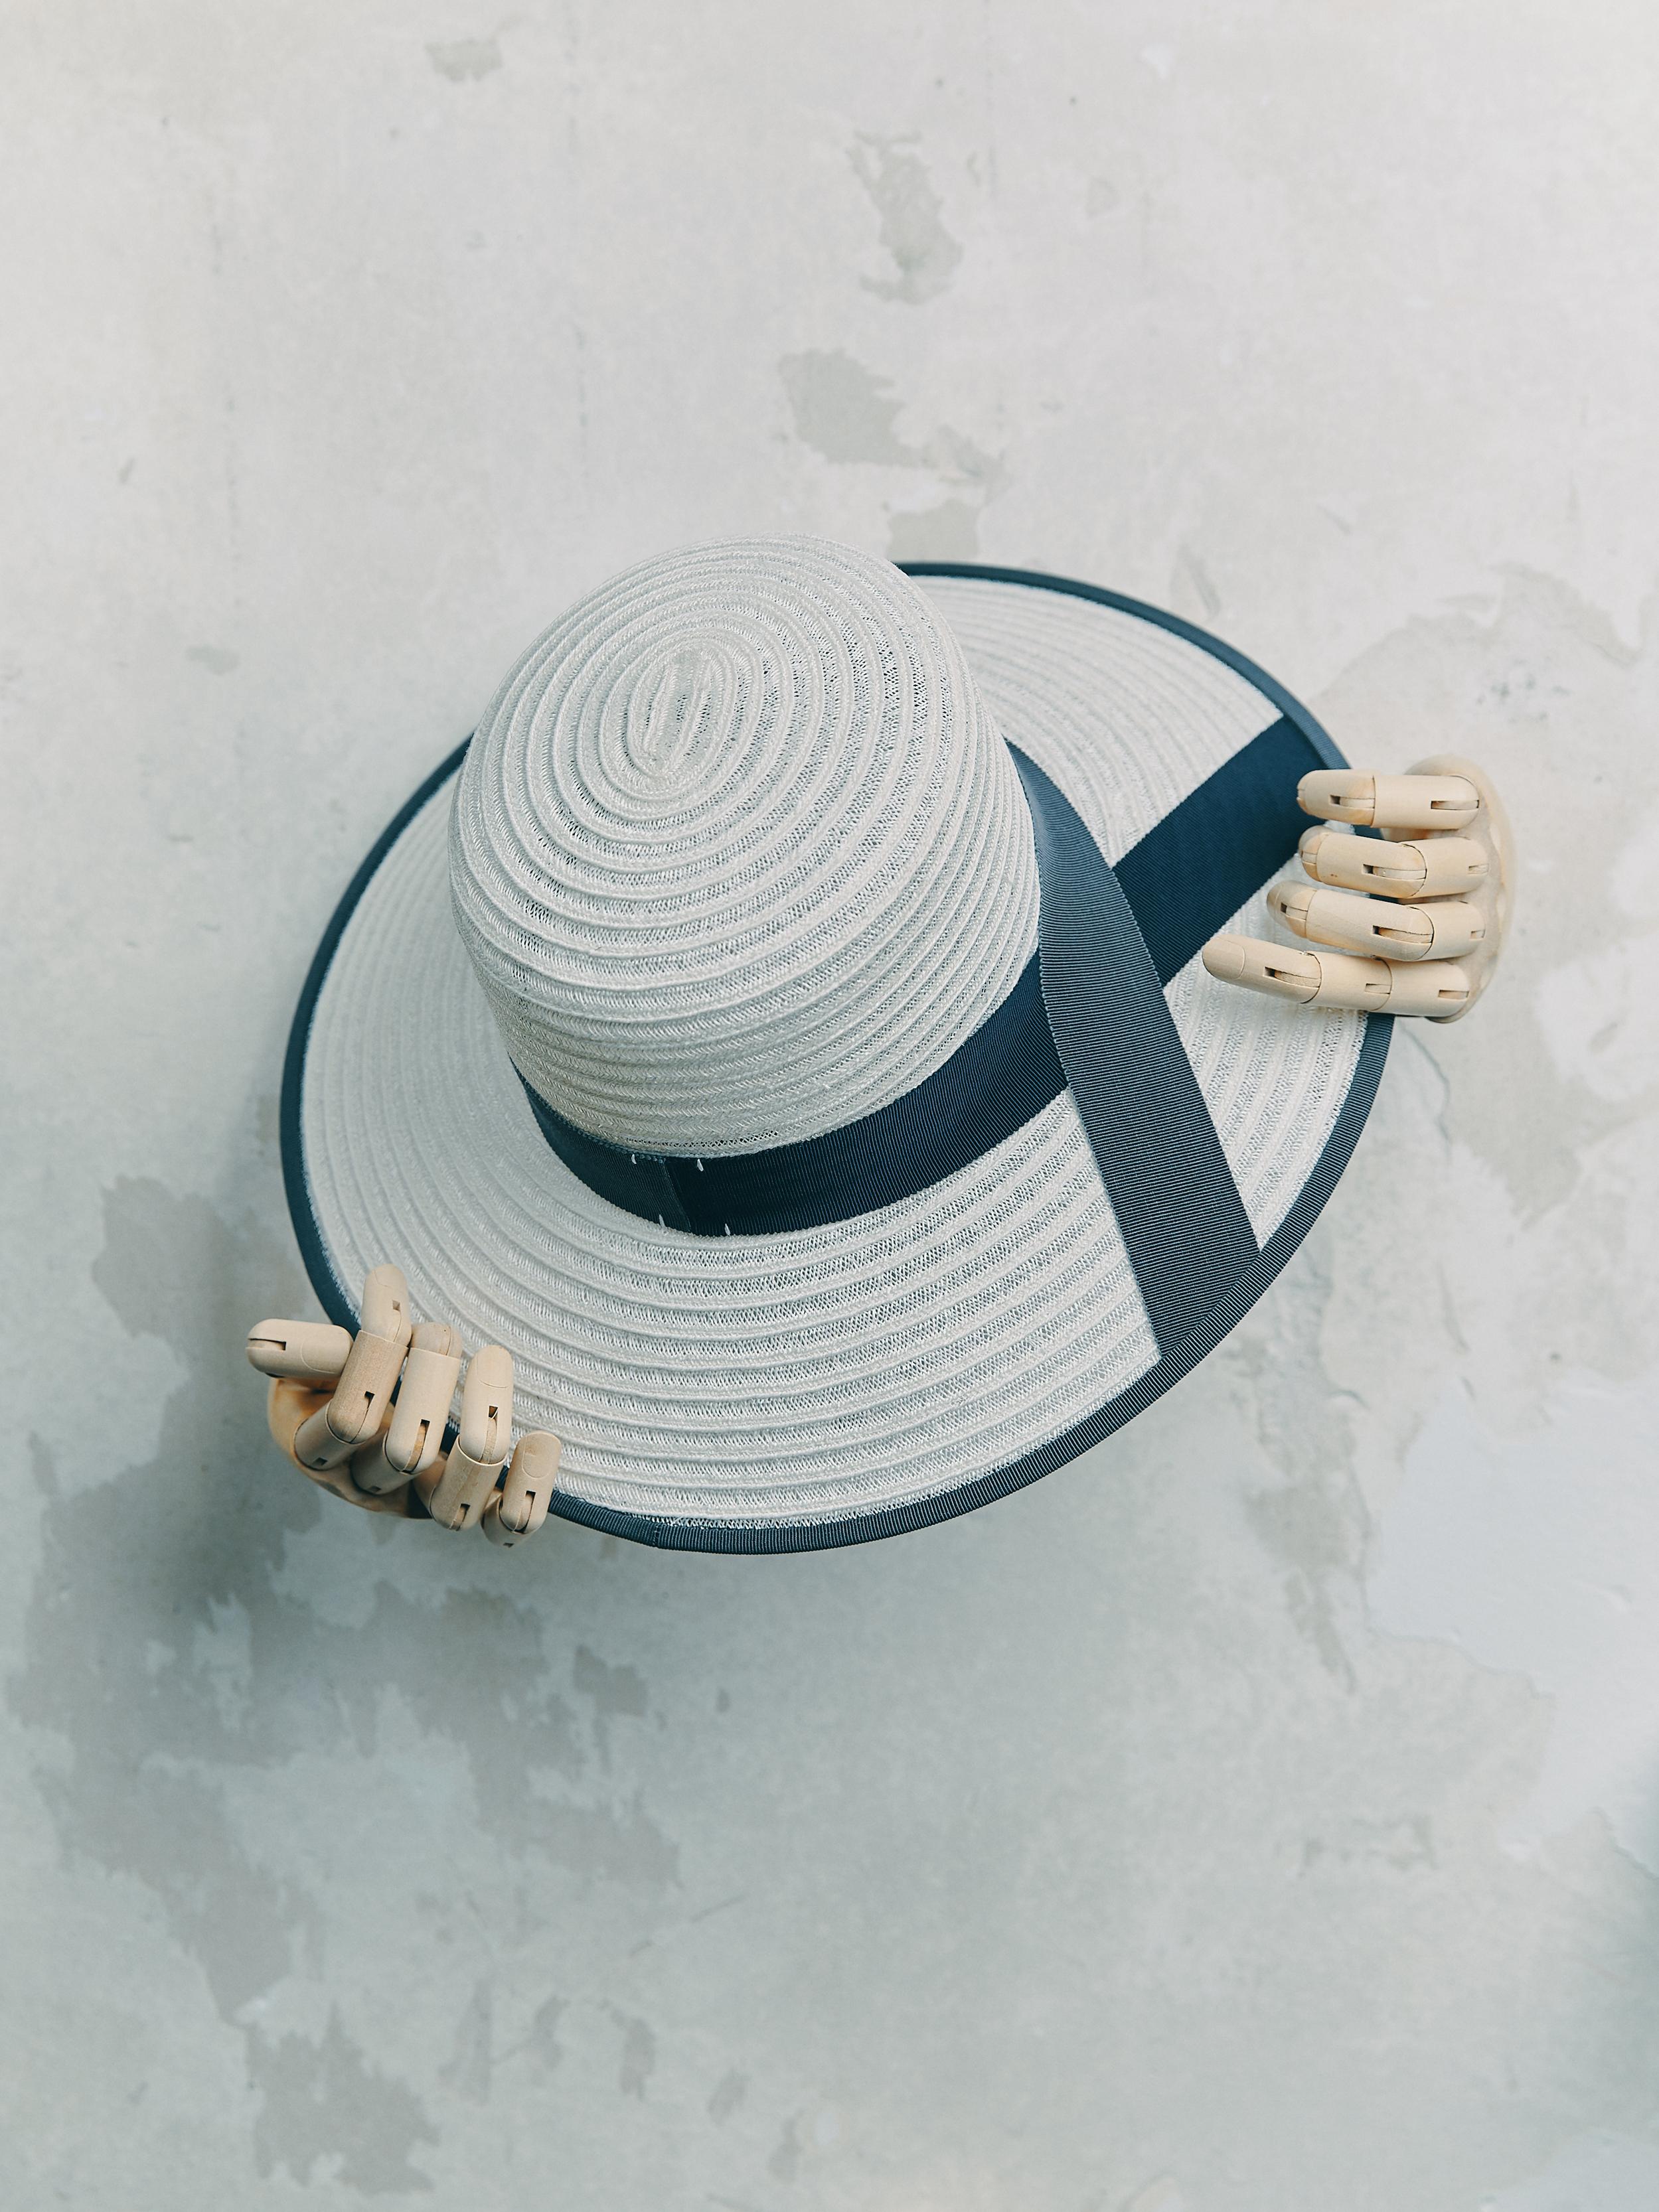 CANOTIER - Bleu Clair bordé ruban Gris Foncé